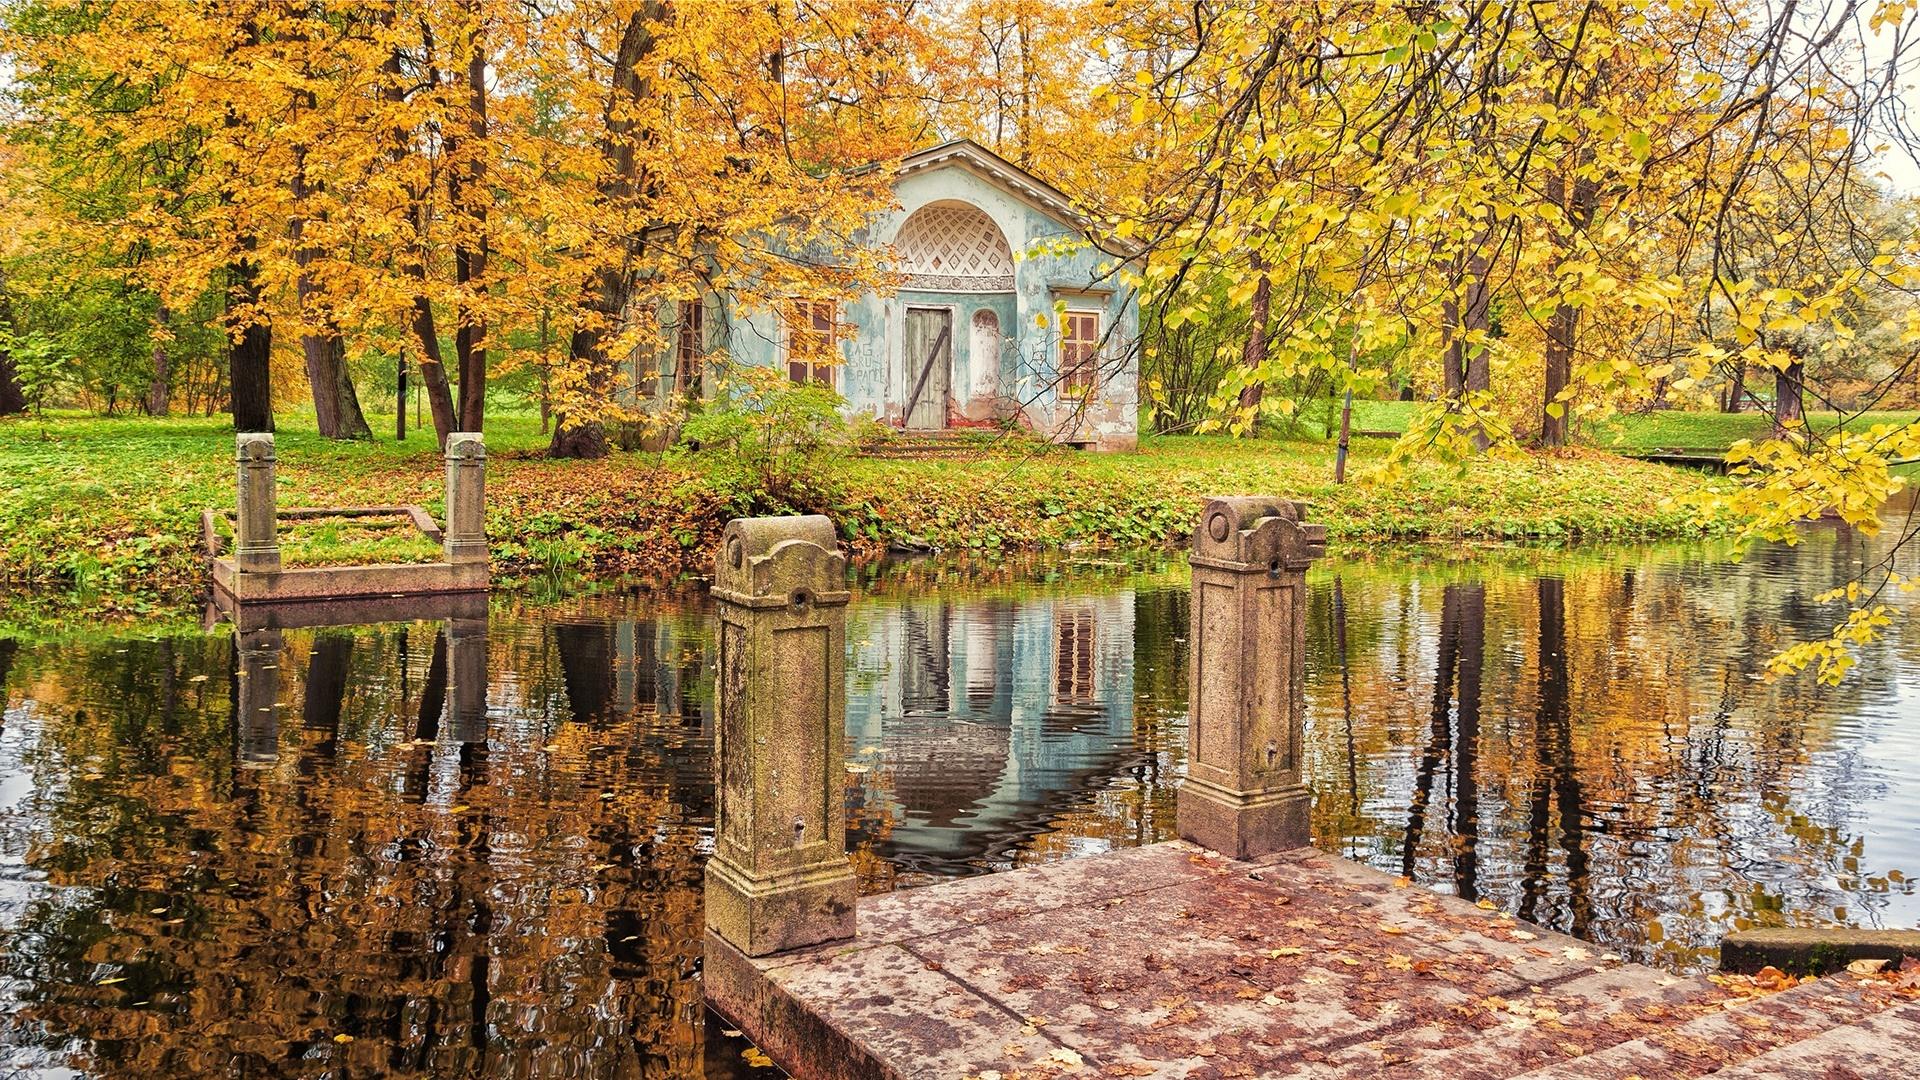 Romantic autumn scenery wallpaper